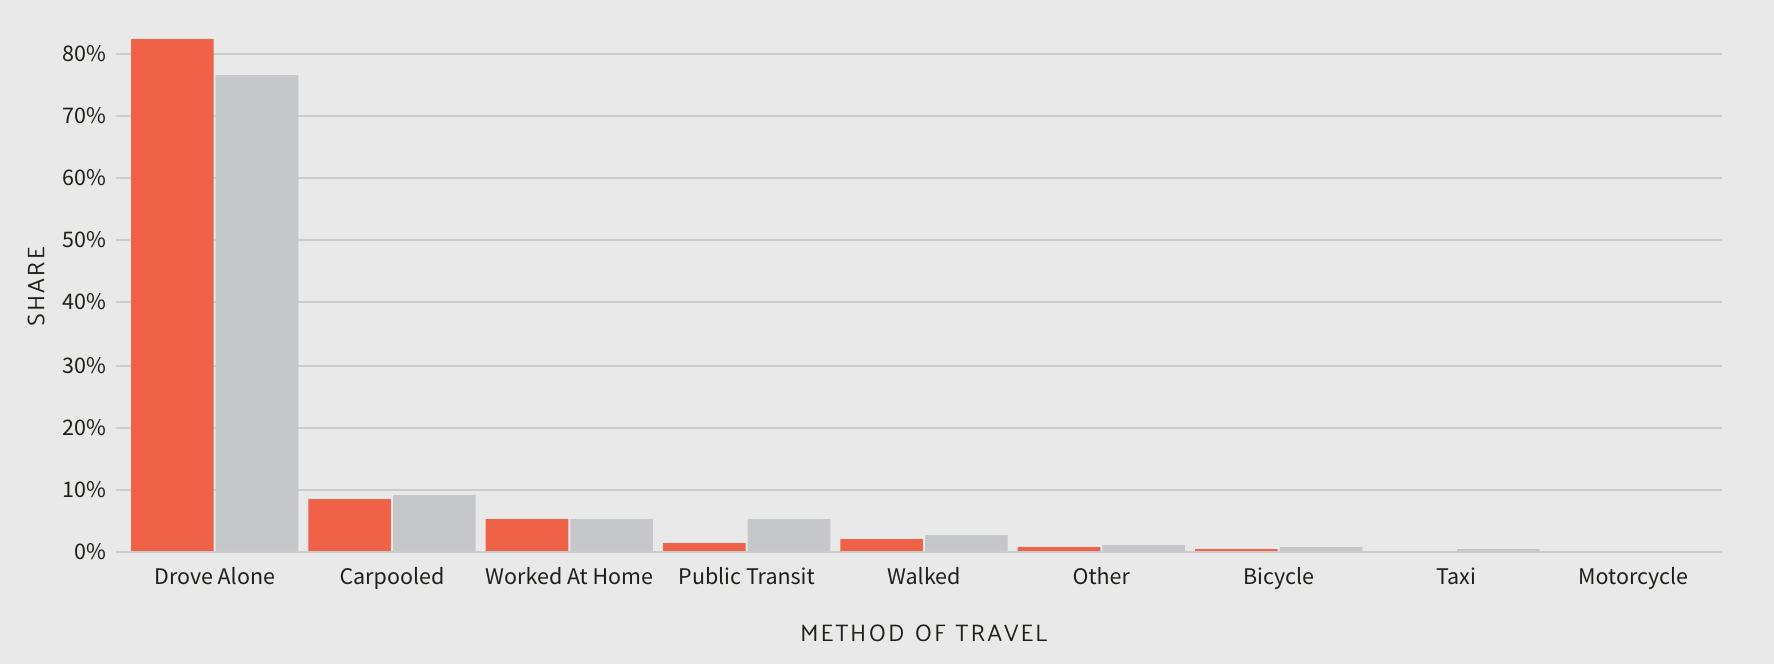 Method of Travel in Missouri